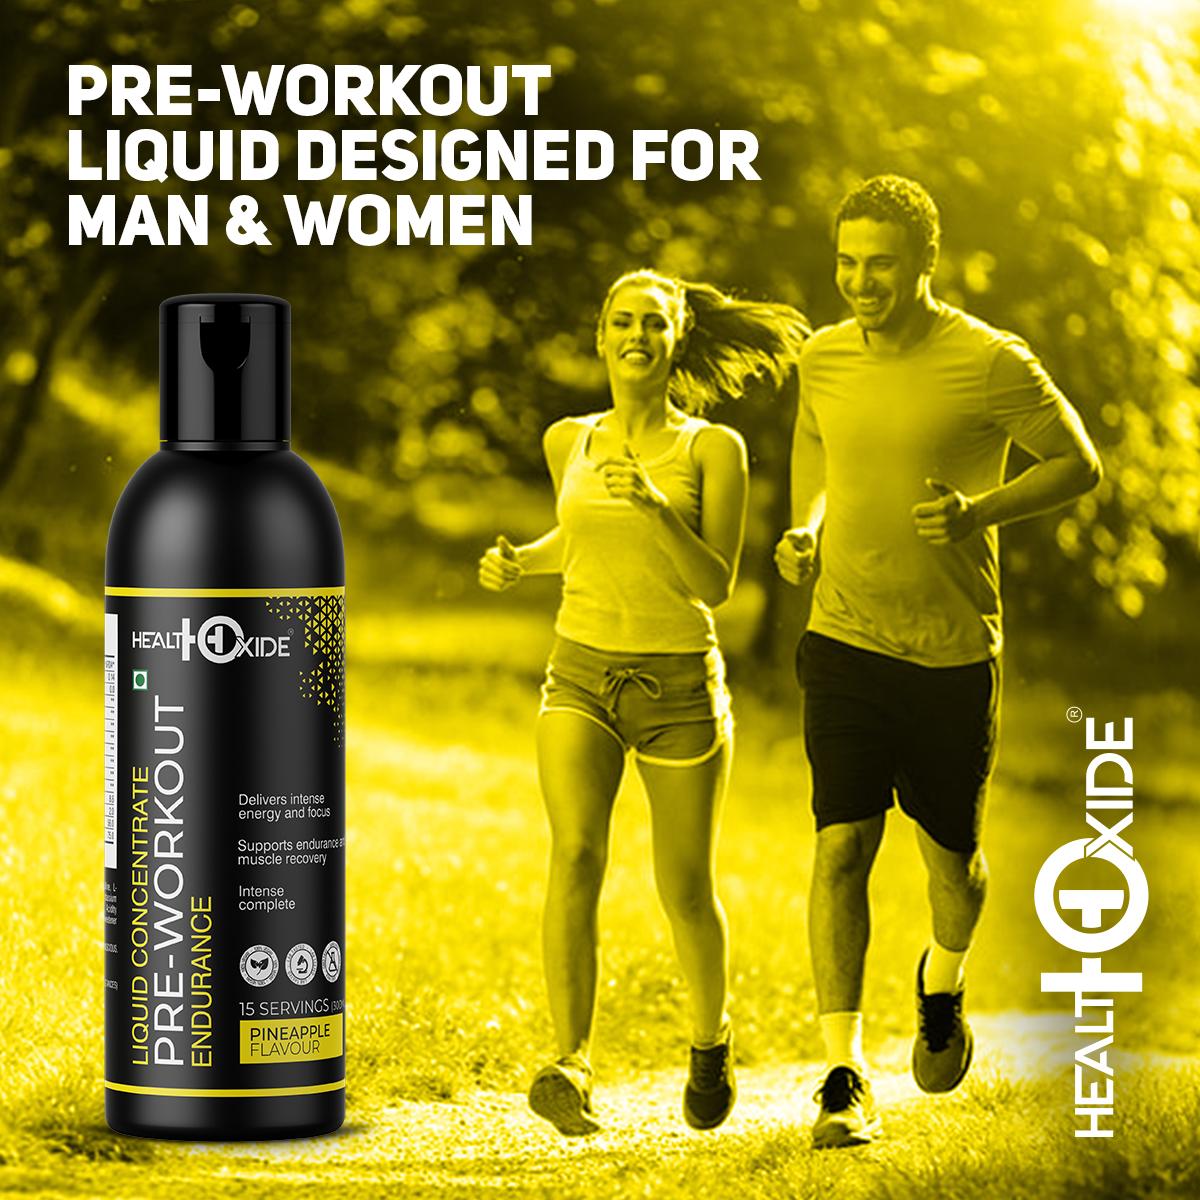 Pre-Workout Liquid